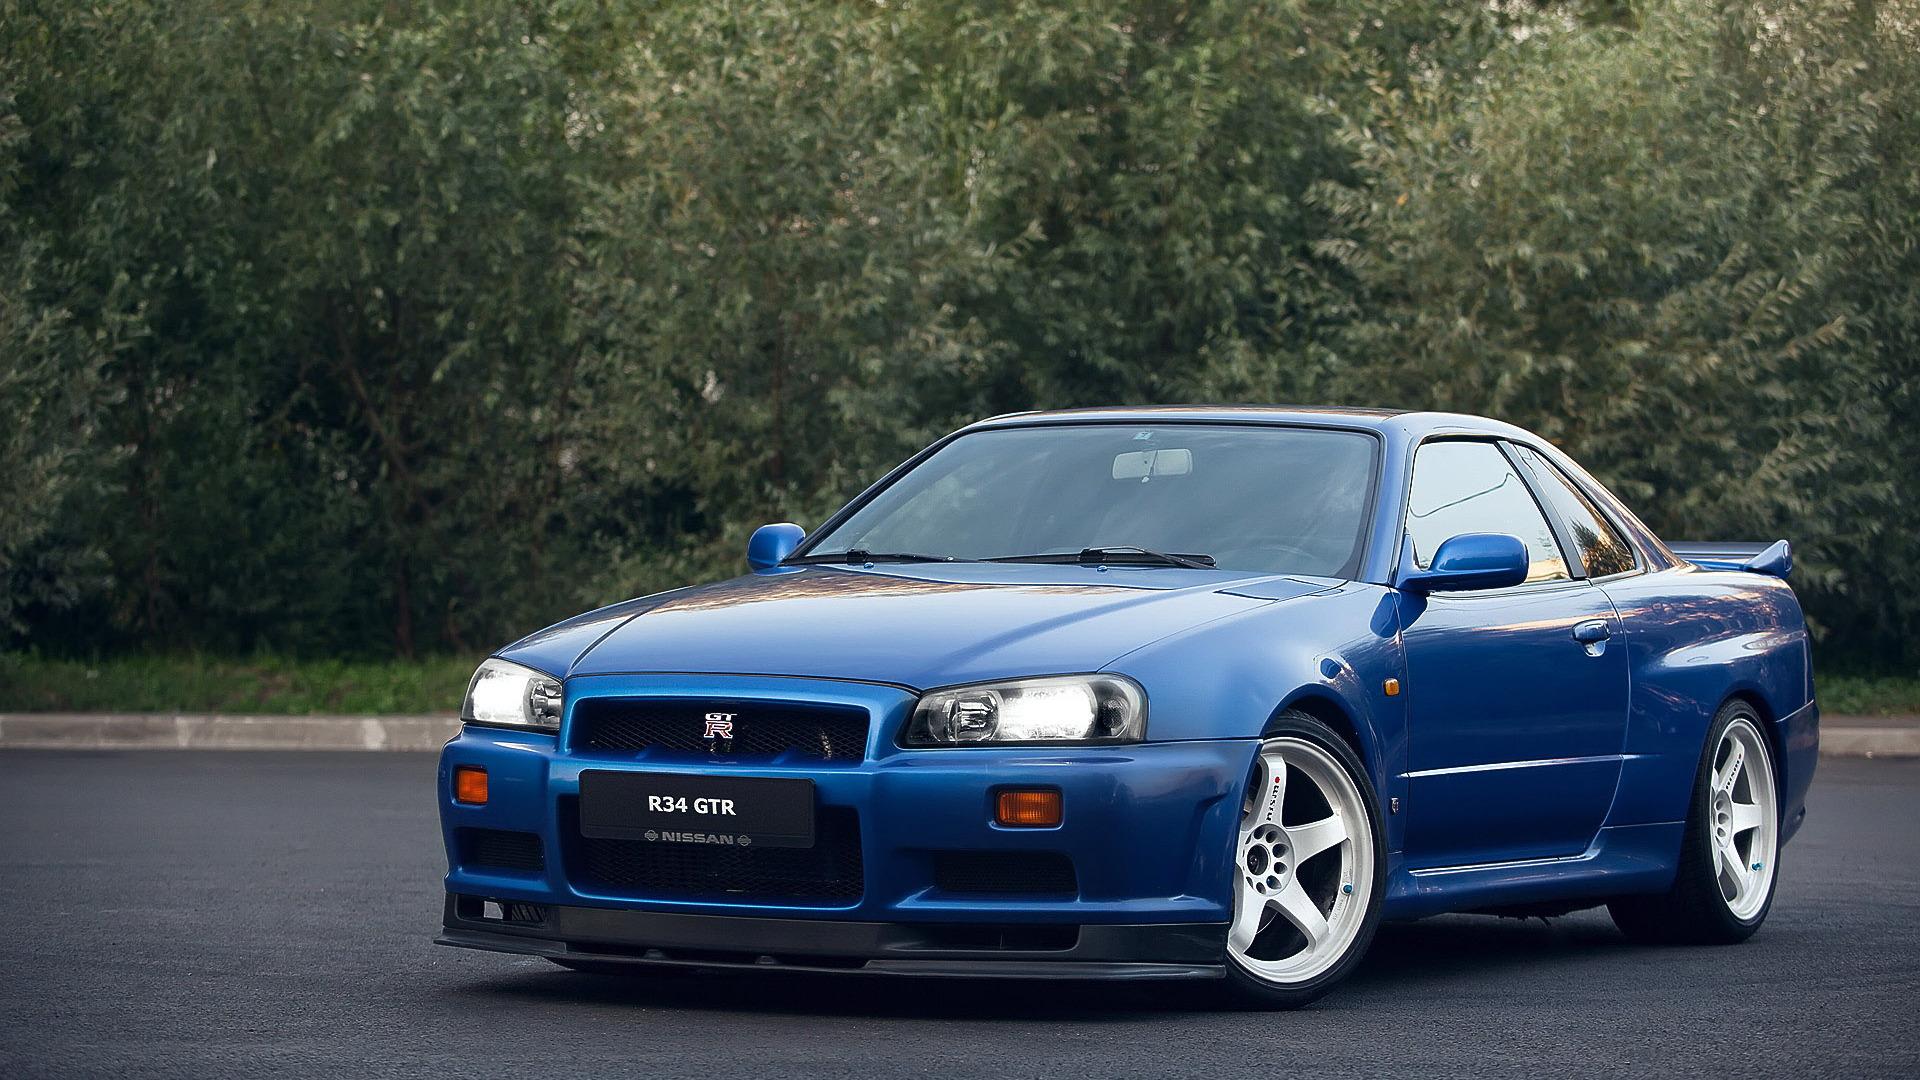 Nissan GT R wallpaper 34480 1920x1080